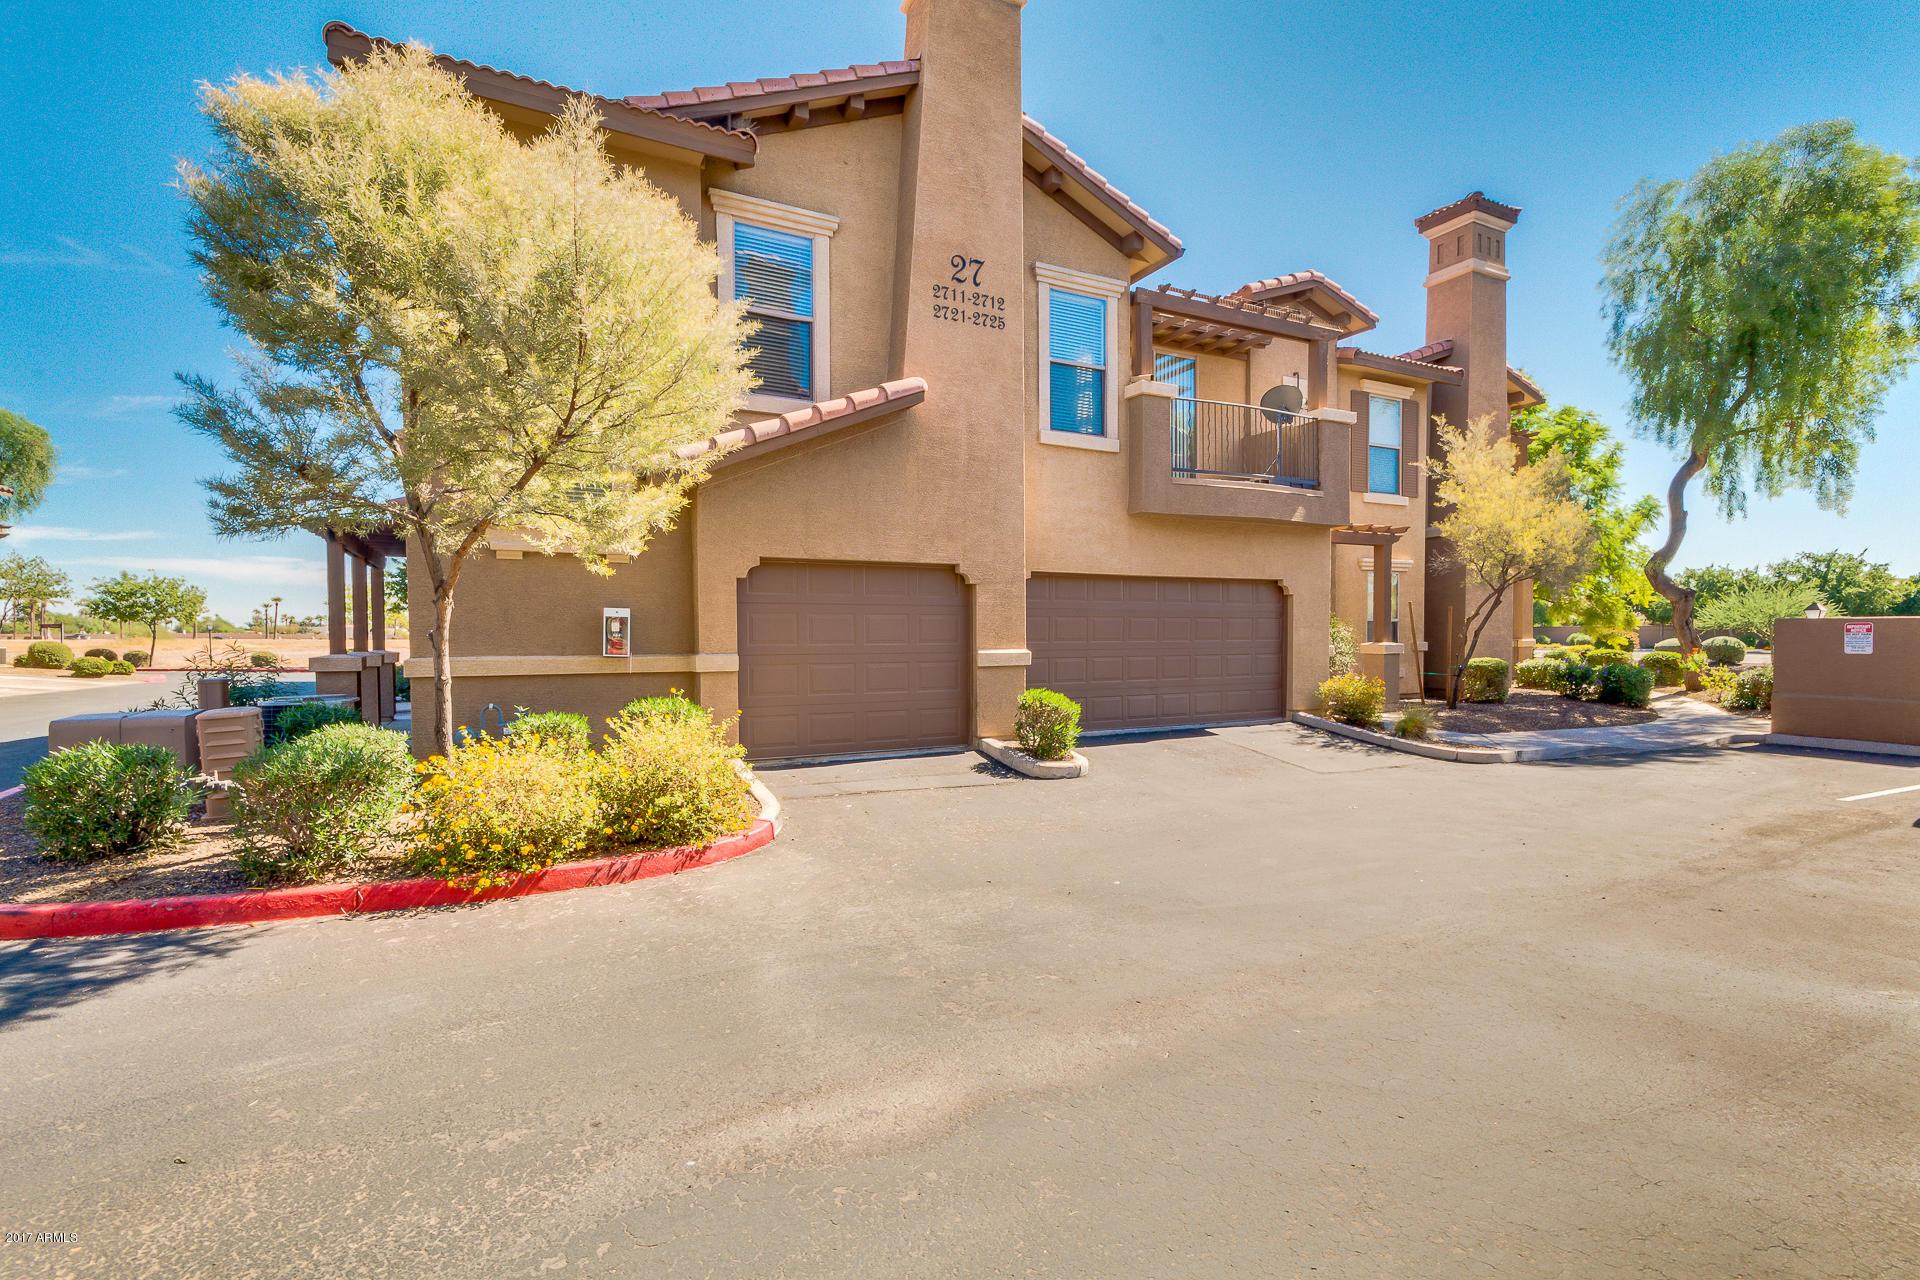 14250 W Wigwam Boulevard, Unit 2721, Litchfield Park AZ 85340 - Photo 1